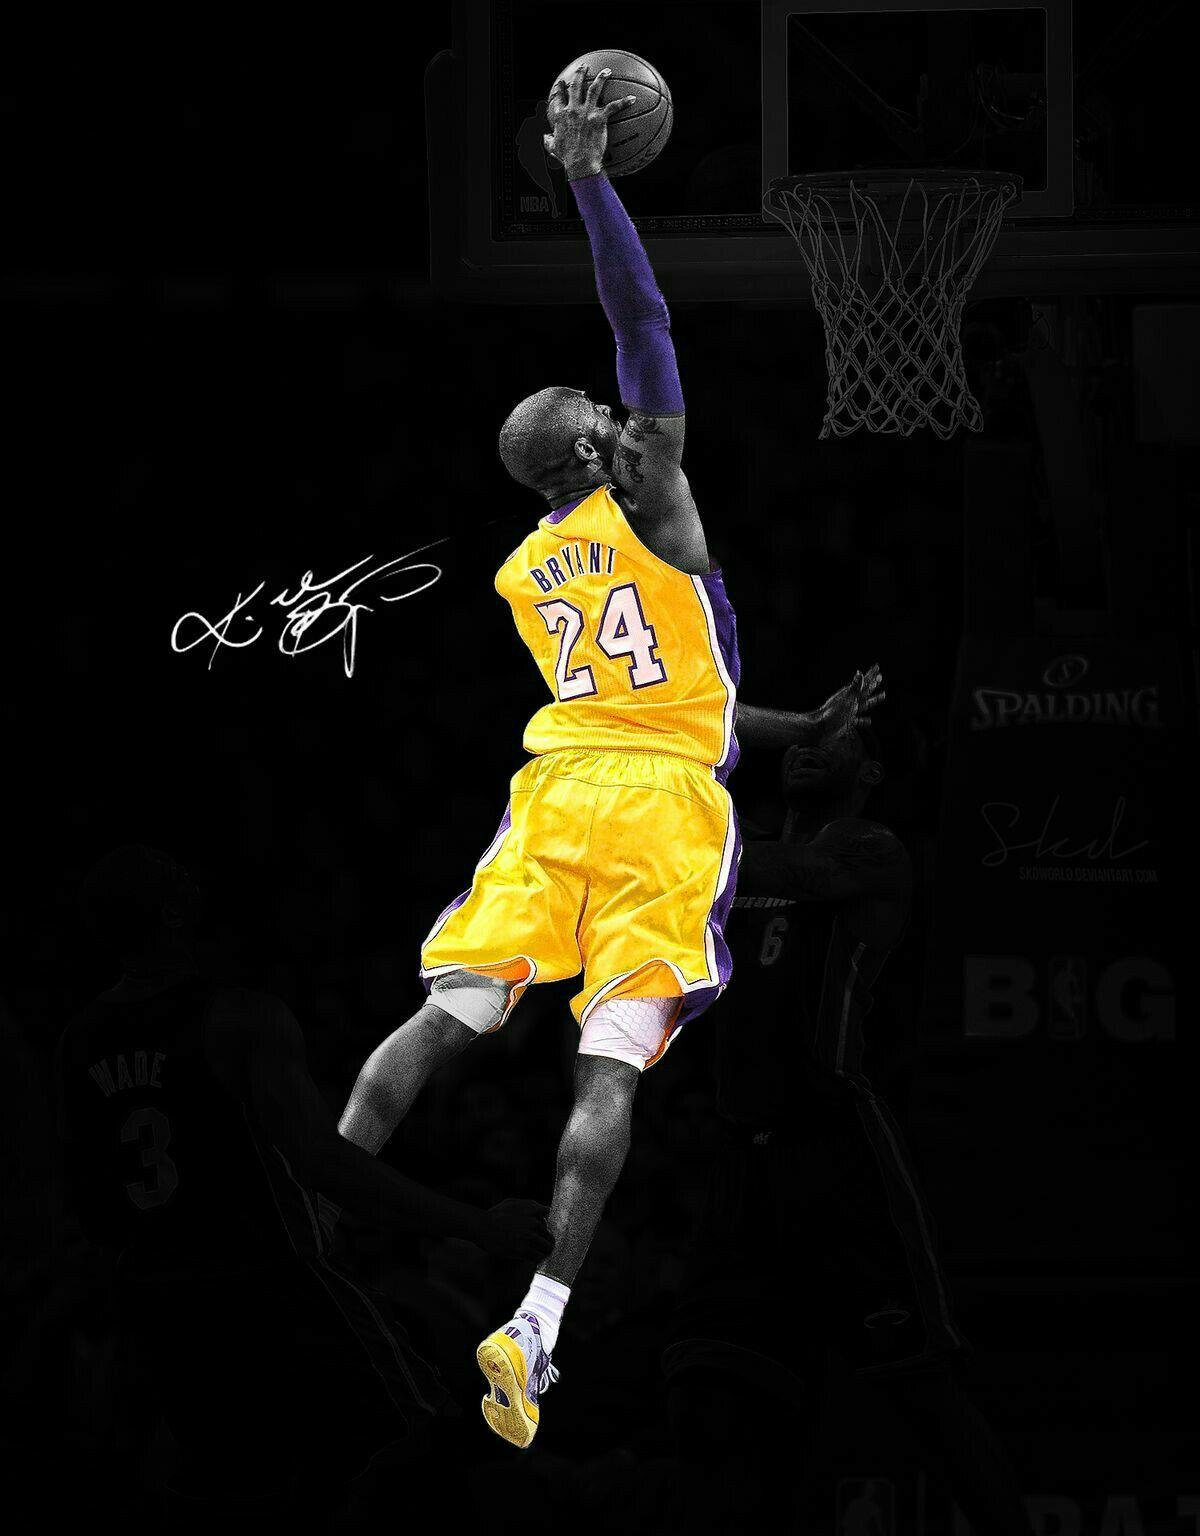 I Love Him As A Basketball Player In 2020 Kobe Bryant Wallpaper Kobe Bryant Dunk Kobe Bryant Poster